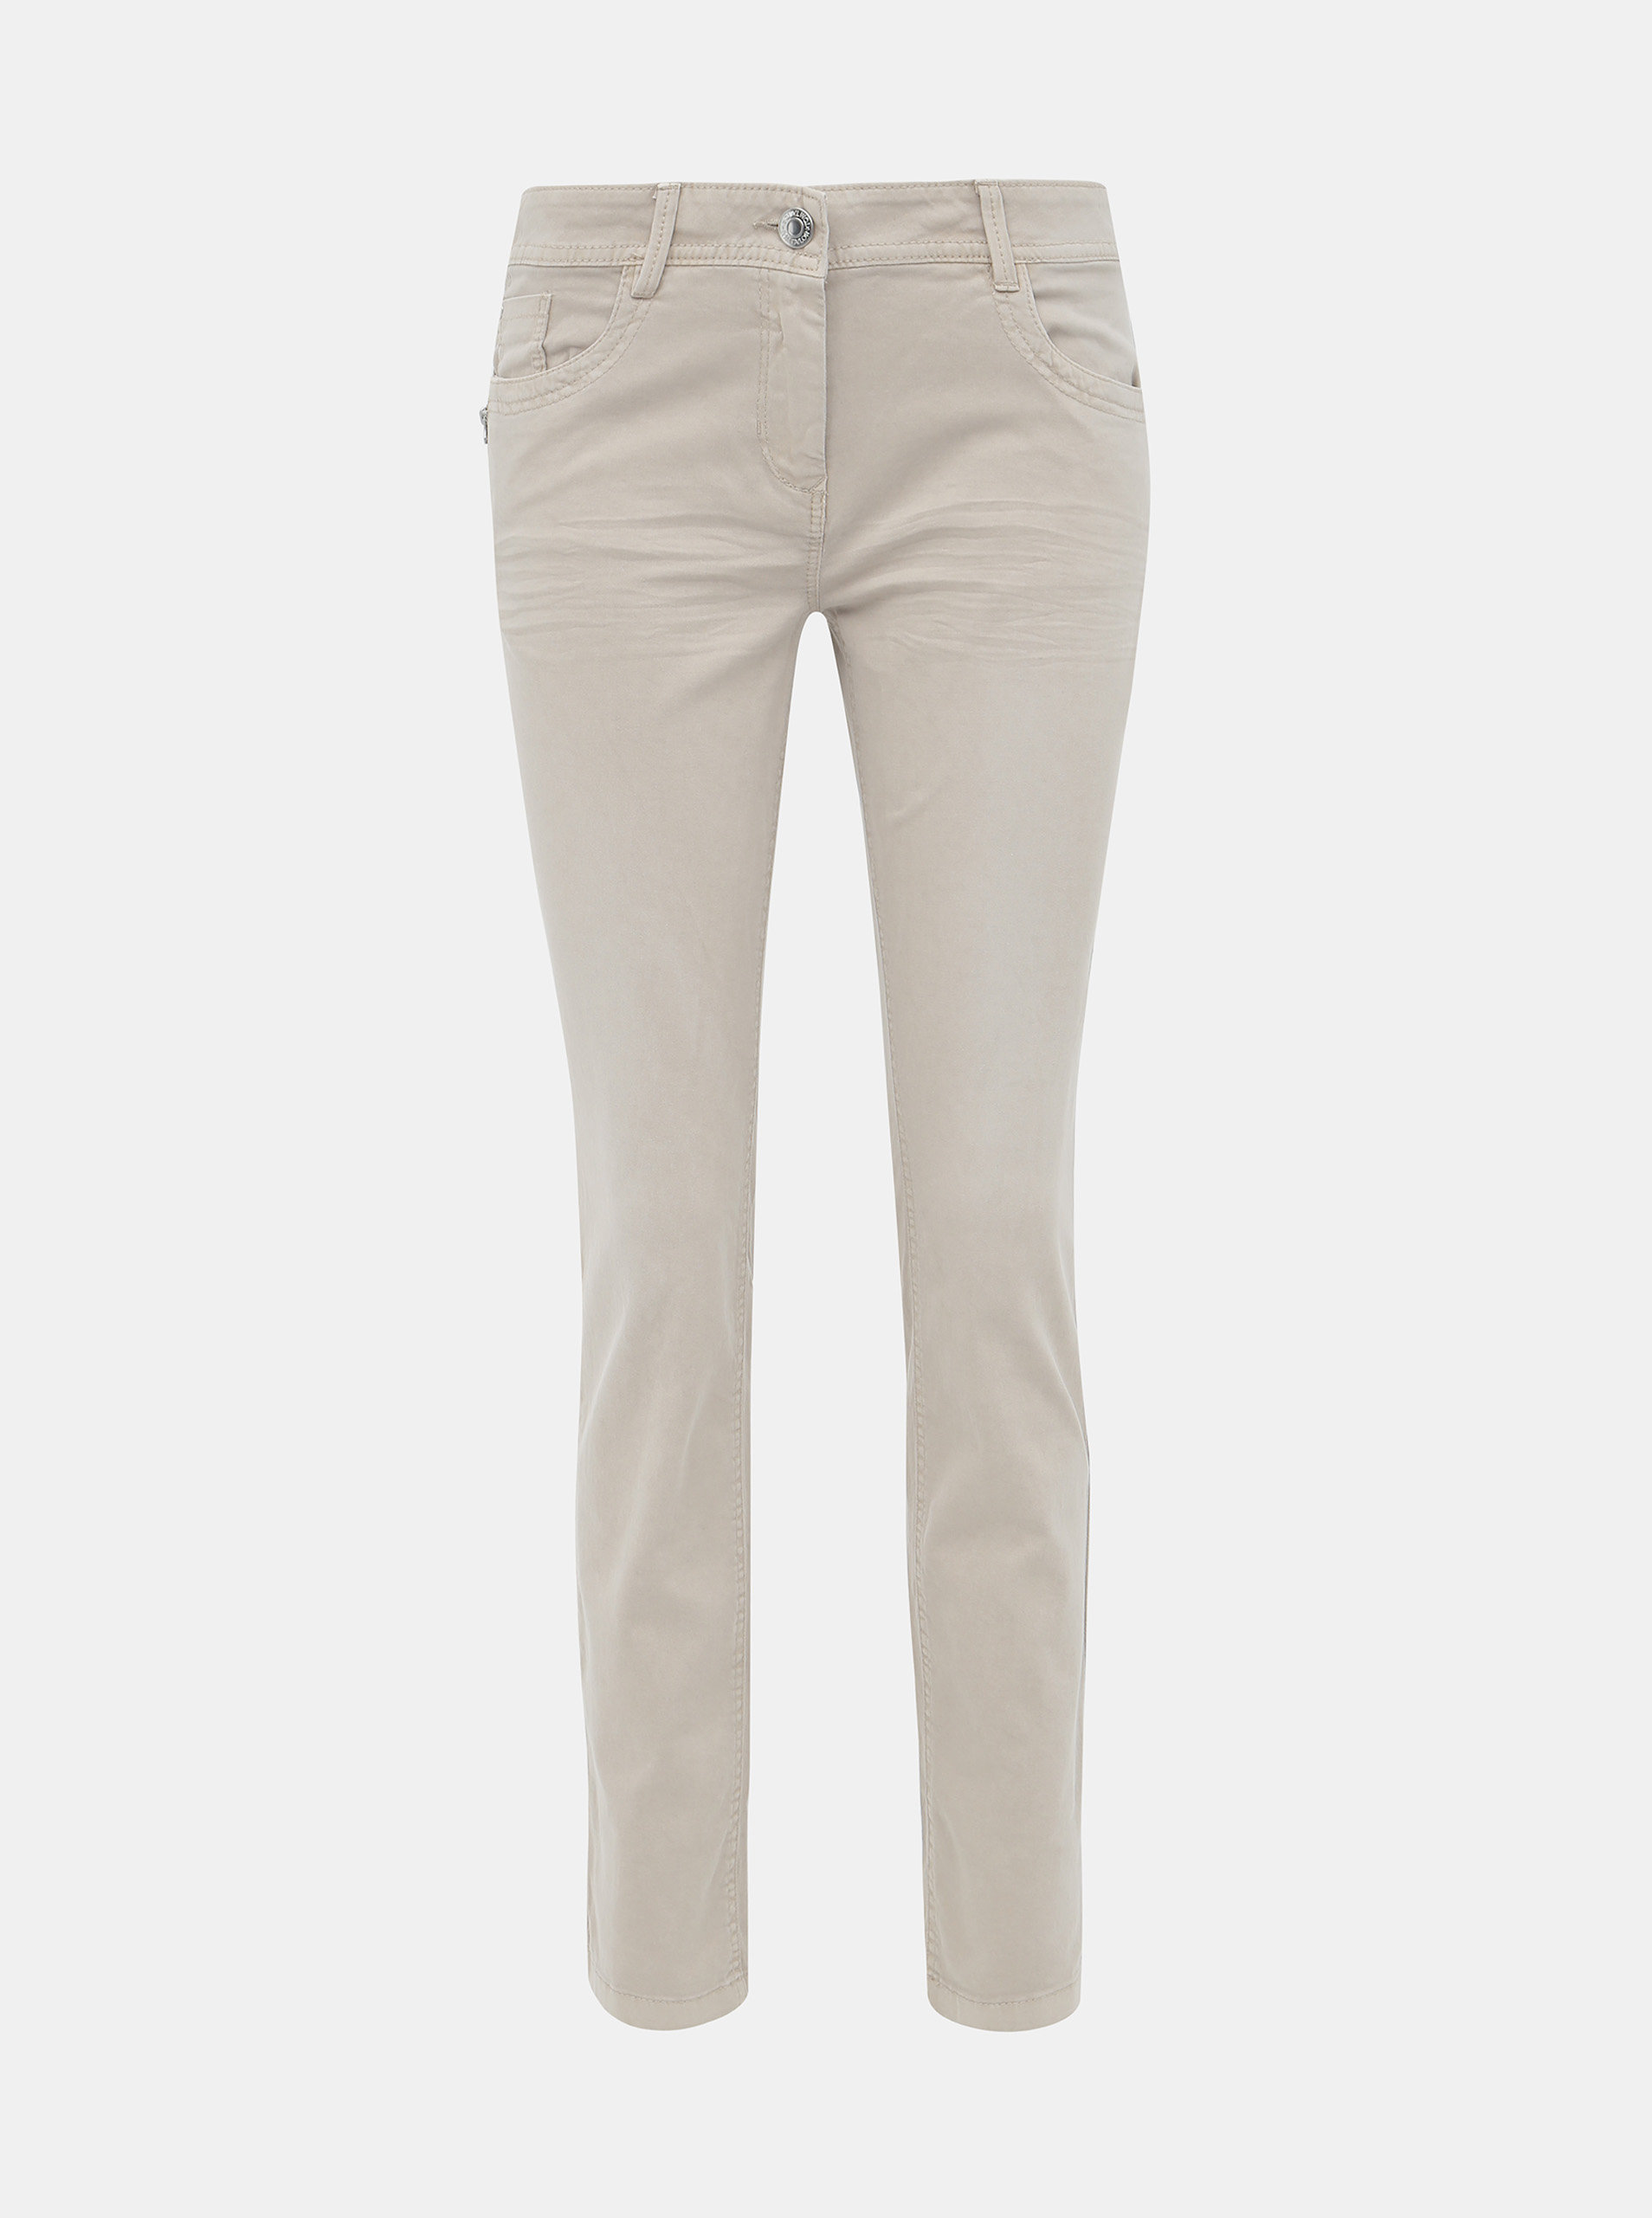 Béžové dámské slim fit džíny Tom Tailor Alexa